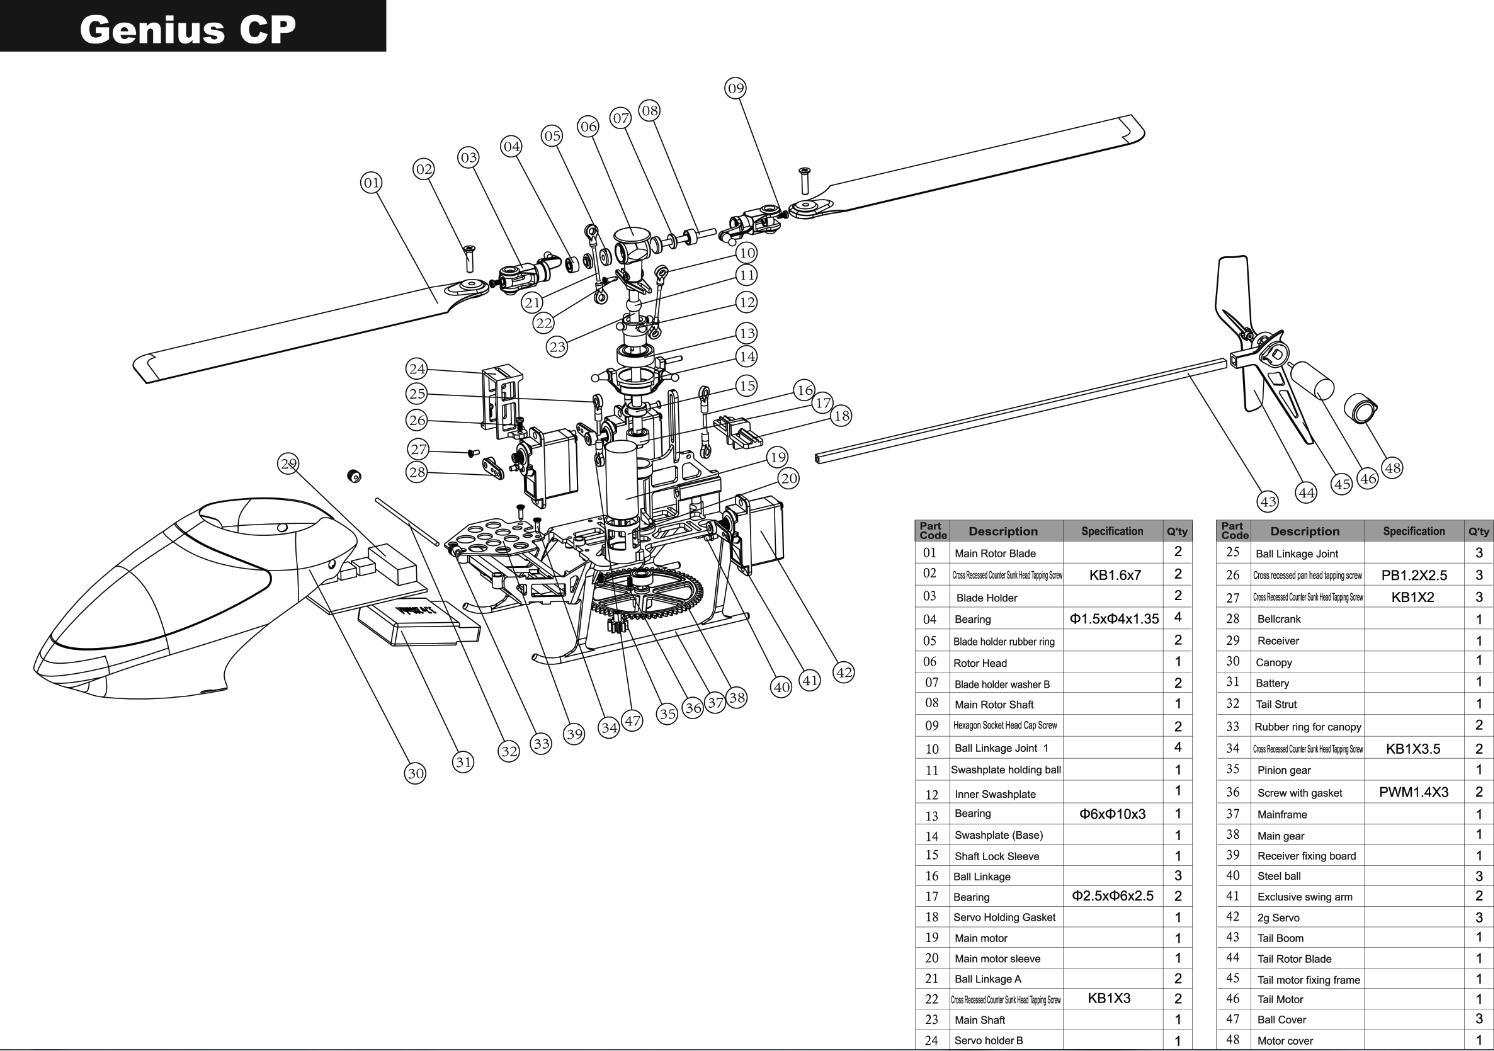 v911 helicopter manual pdf